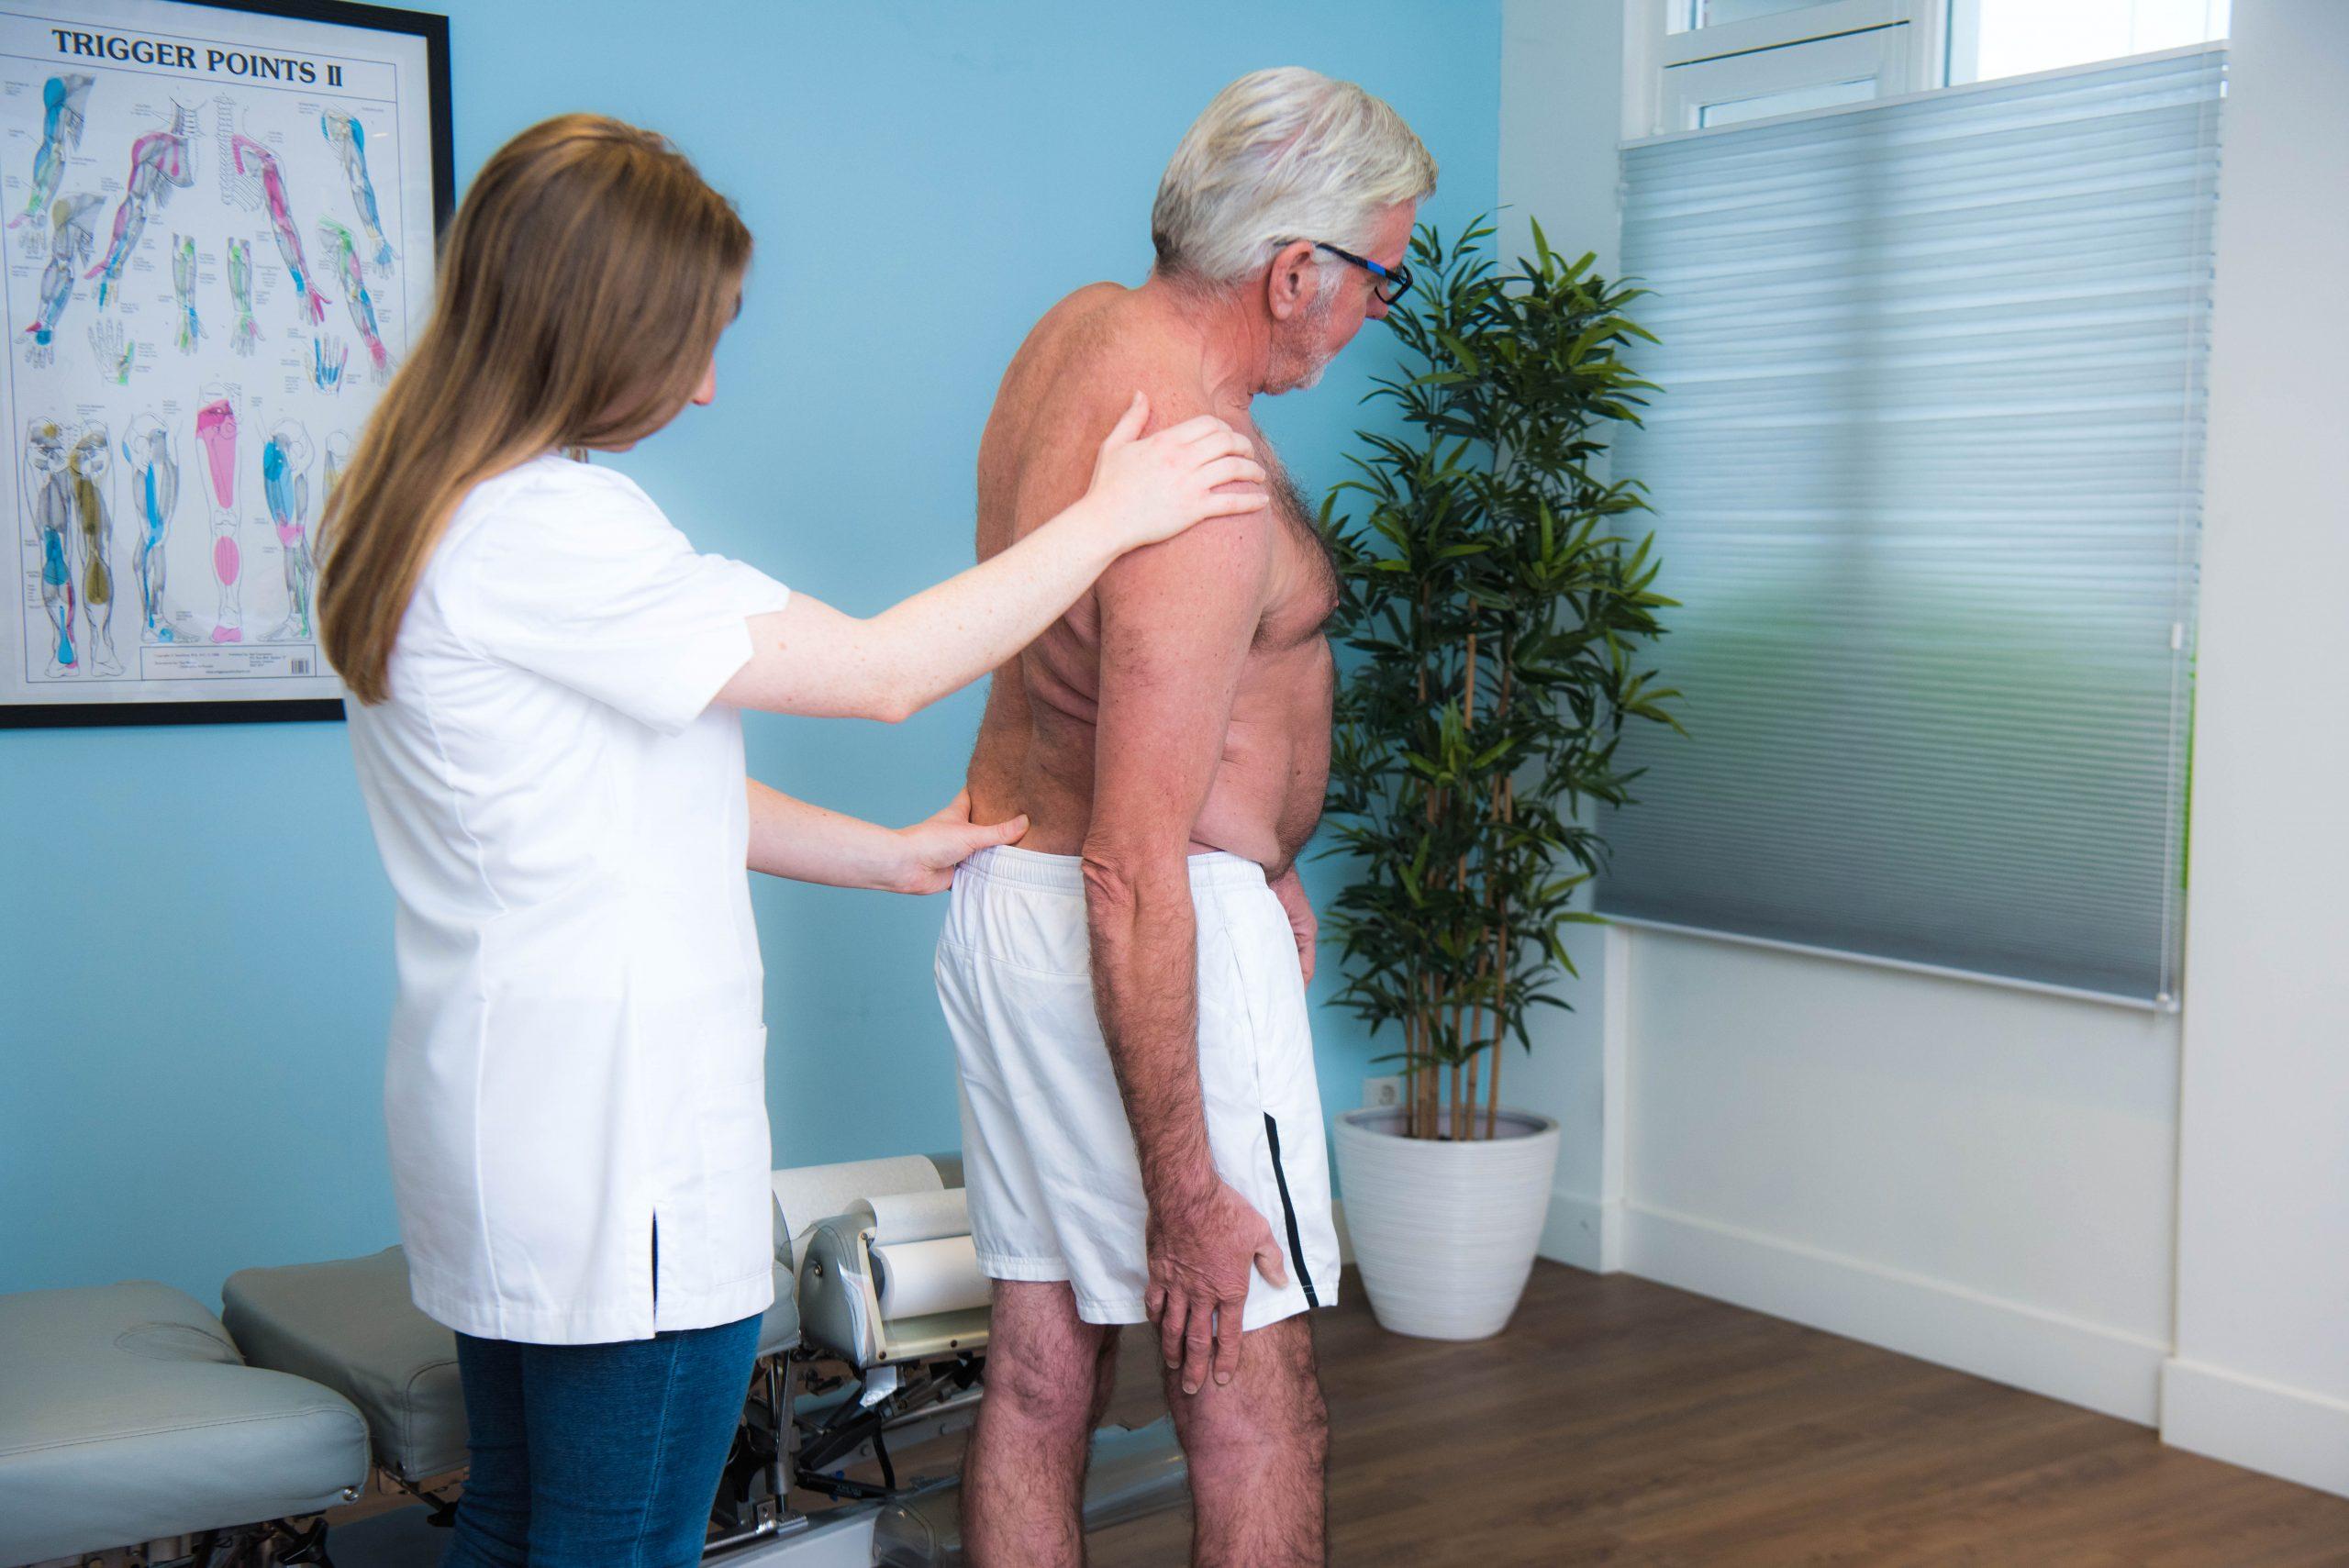 Chiropractor Checkt Rug Oudere Patient Met Scoliose